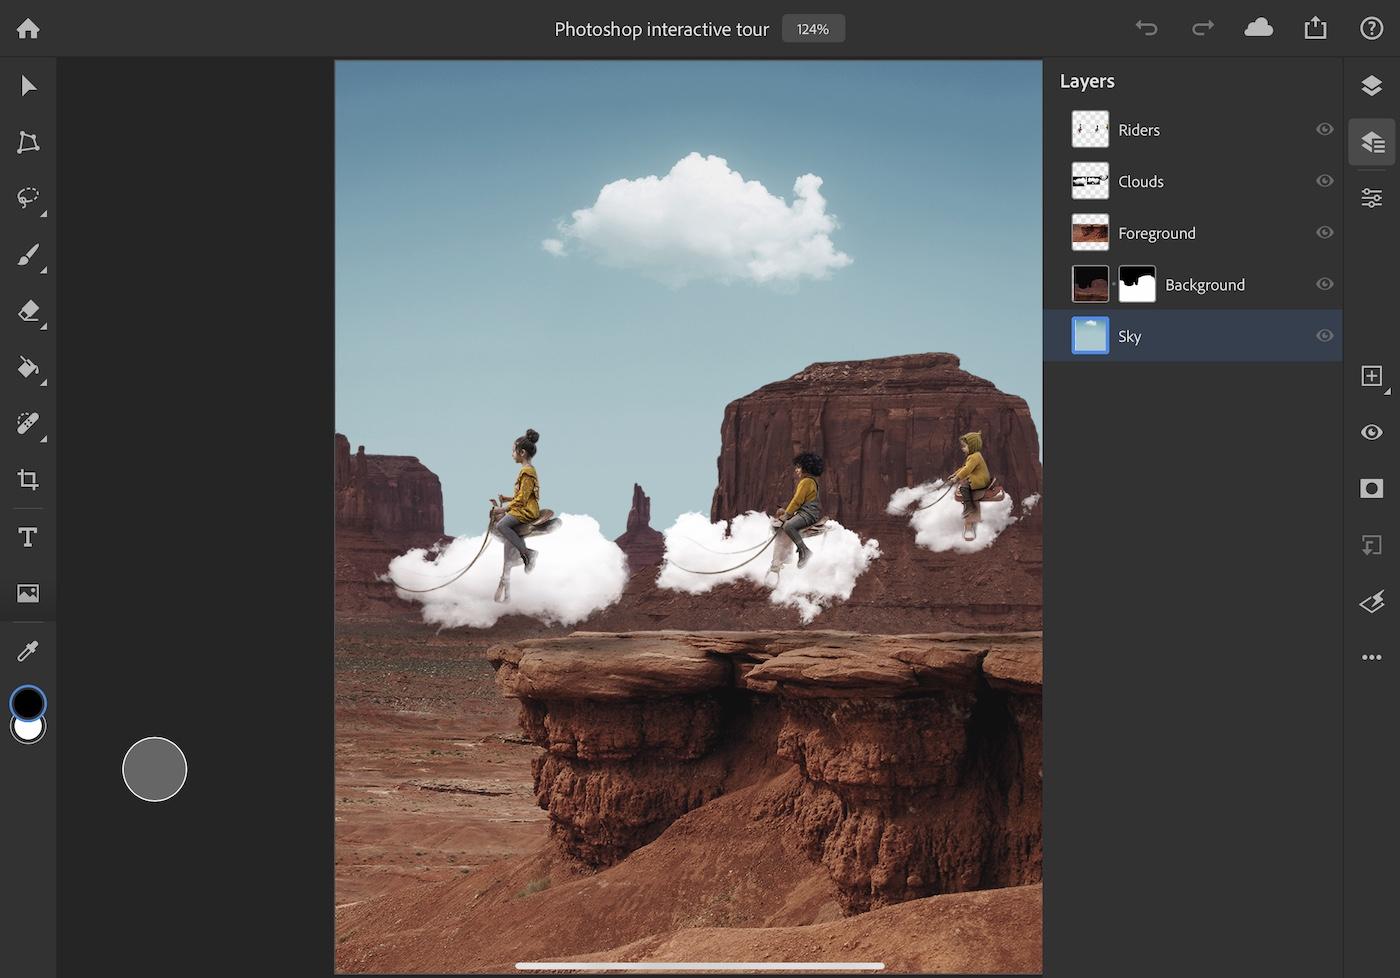 Photoshop for iPad 4